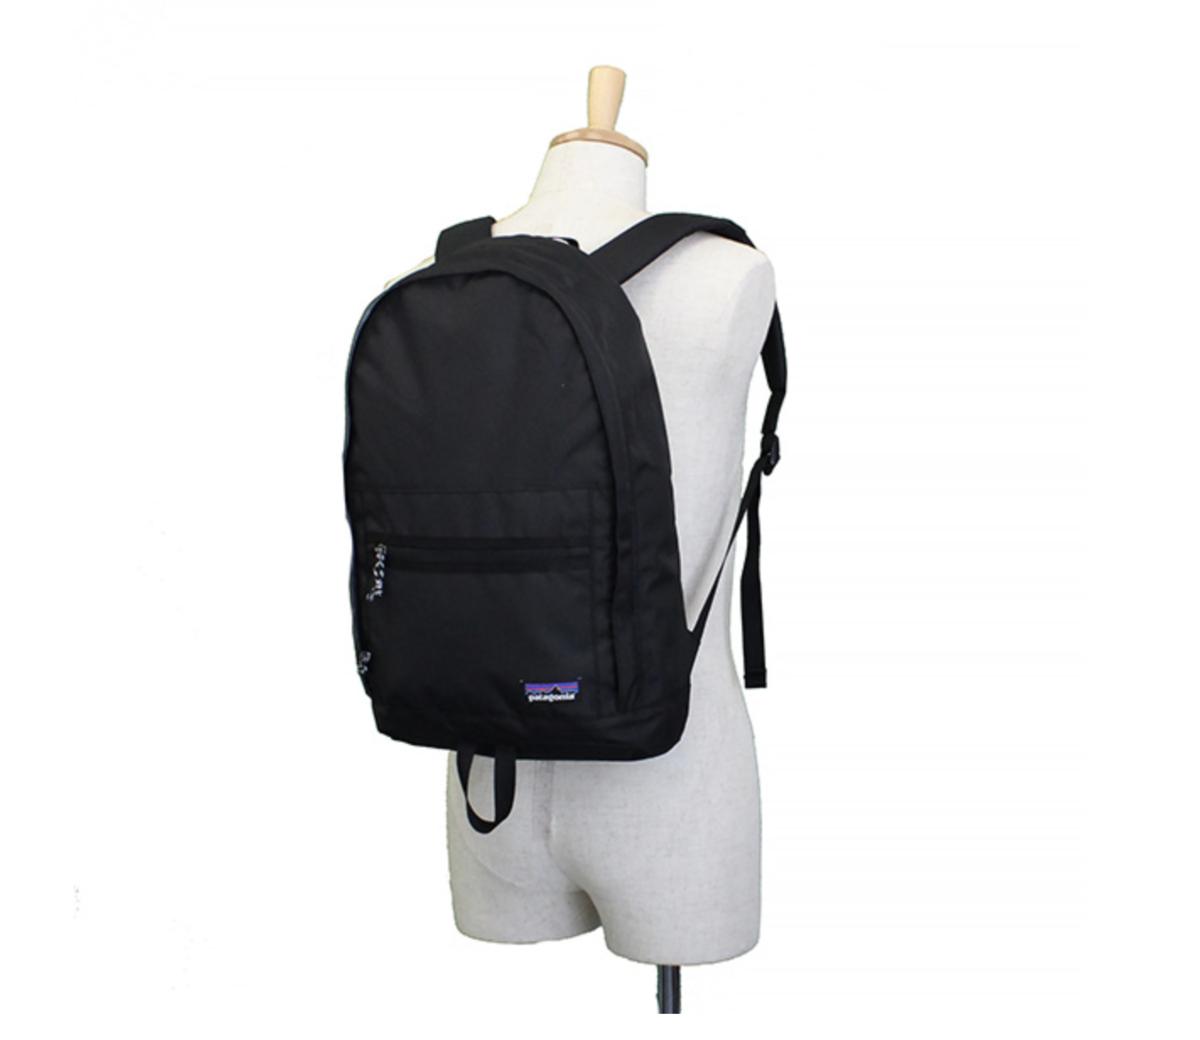 f:id:thebackpack:20190717200214p:plain